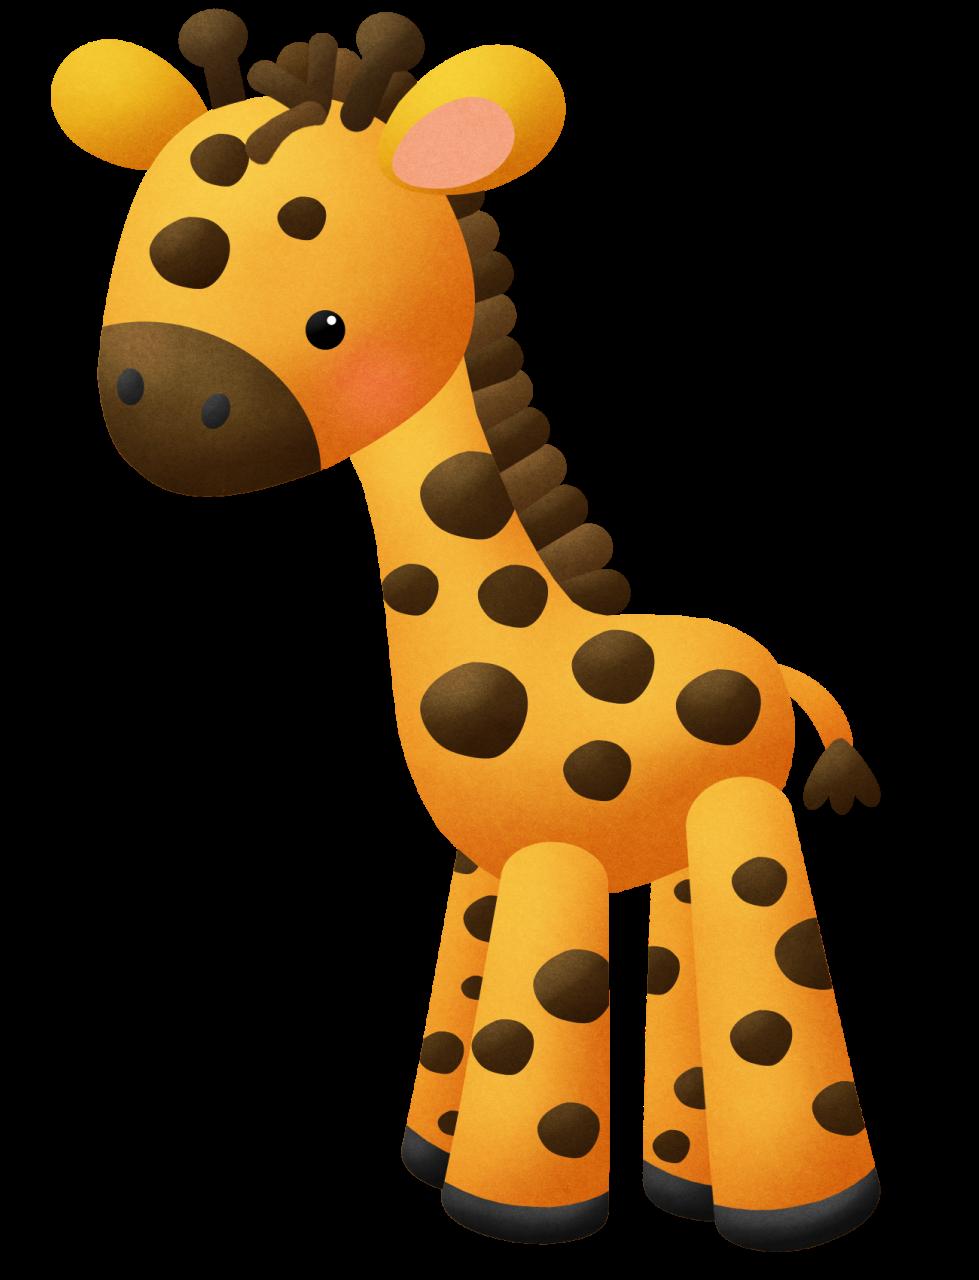 Pin by peggy hollinger. Giraffe clipart grandpa